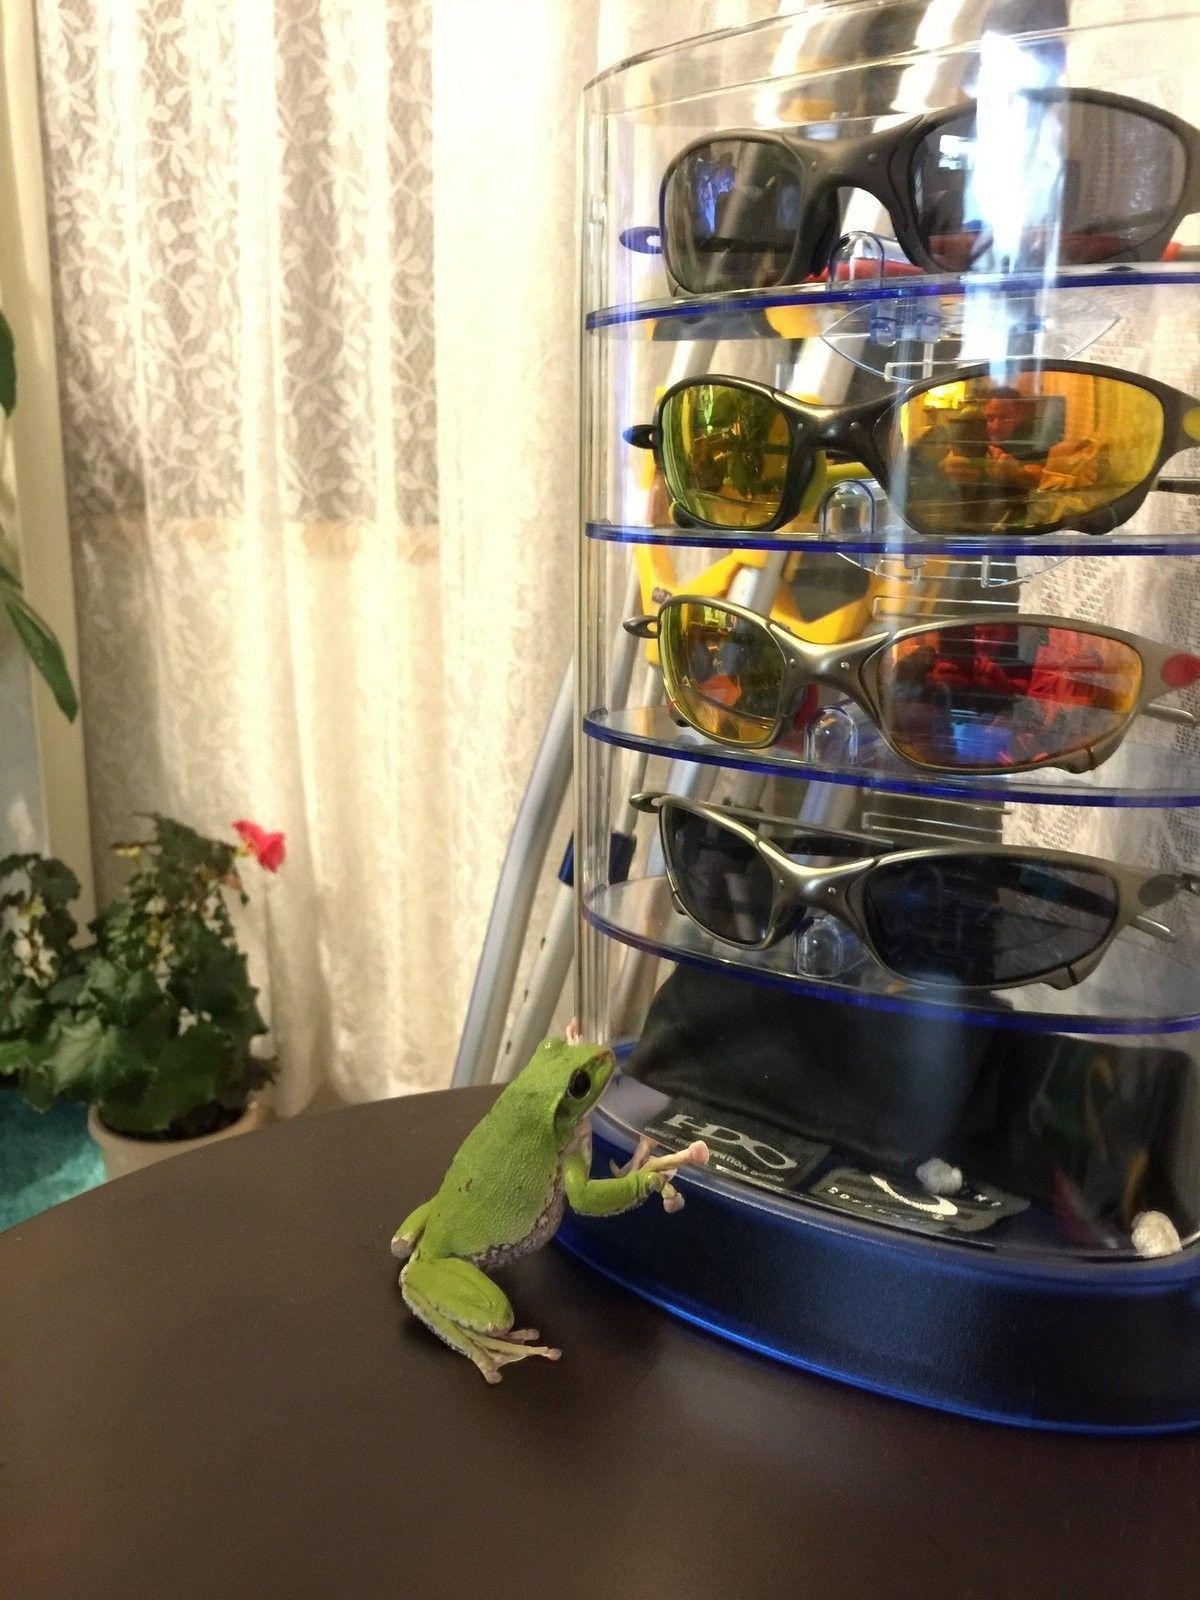 My frog&Juliets. - image.jpg